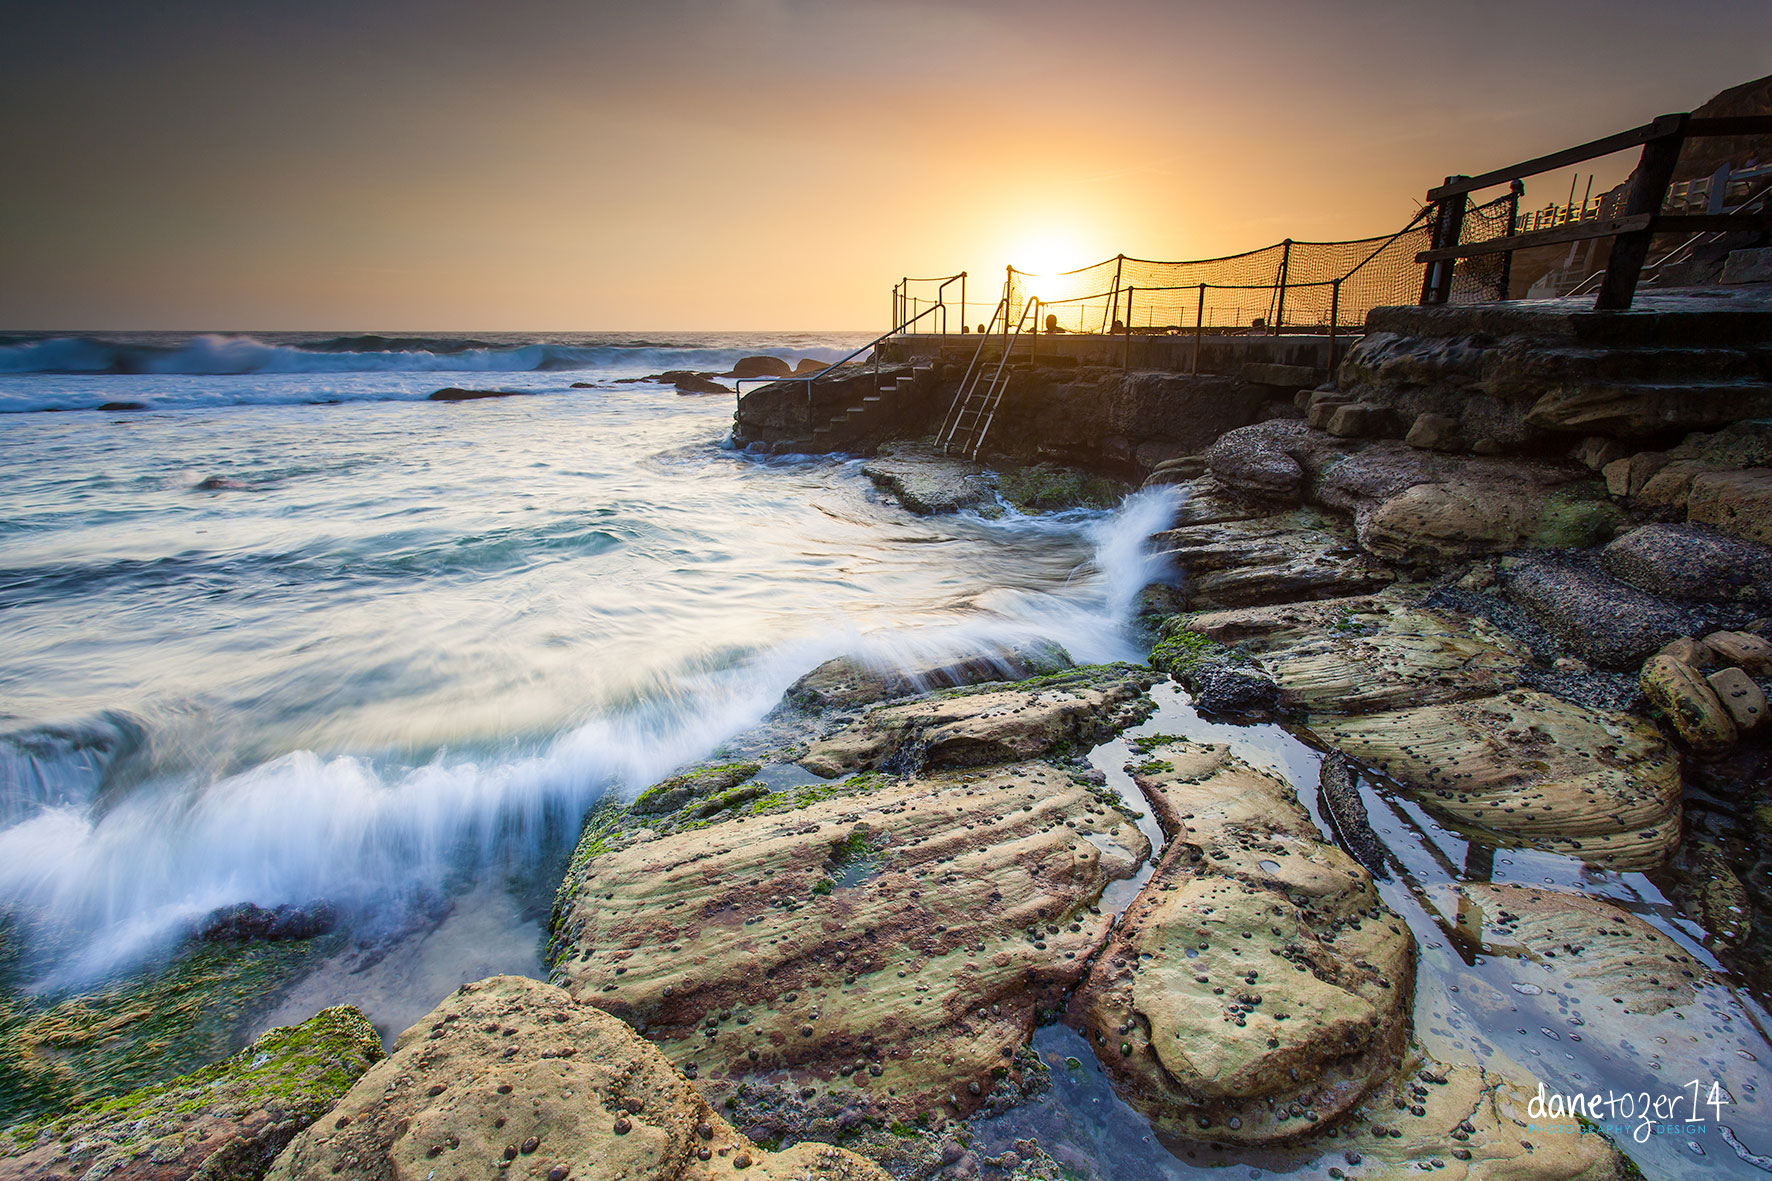 Bronte Beach NSW